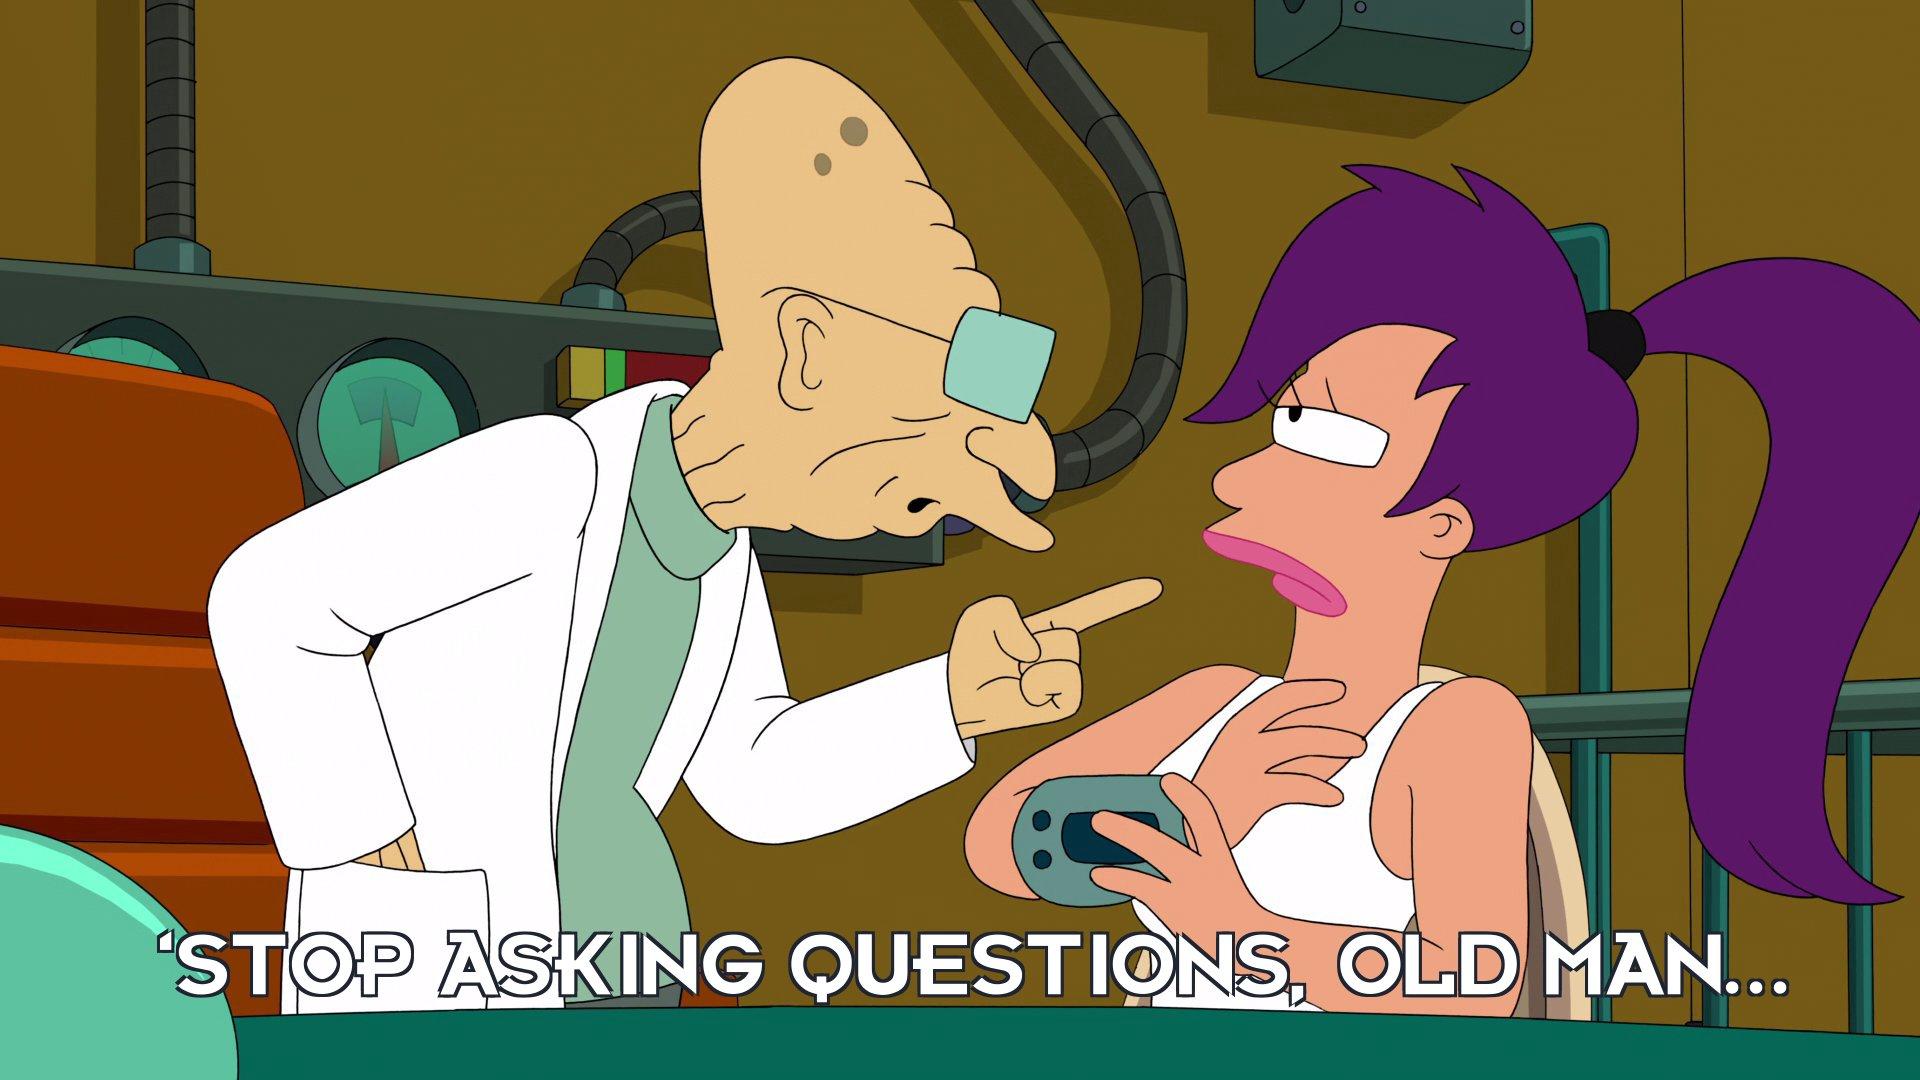 Prof Hubert J Farnsworth: 'Stop asking questions, old man...